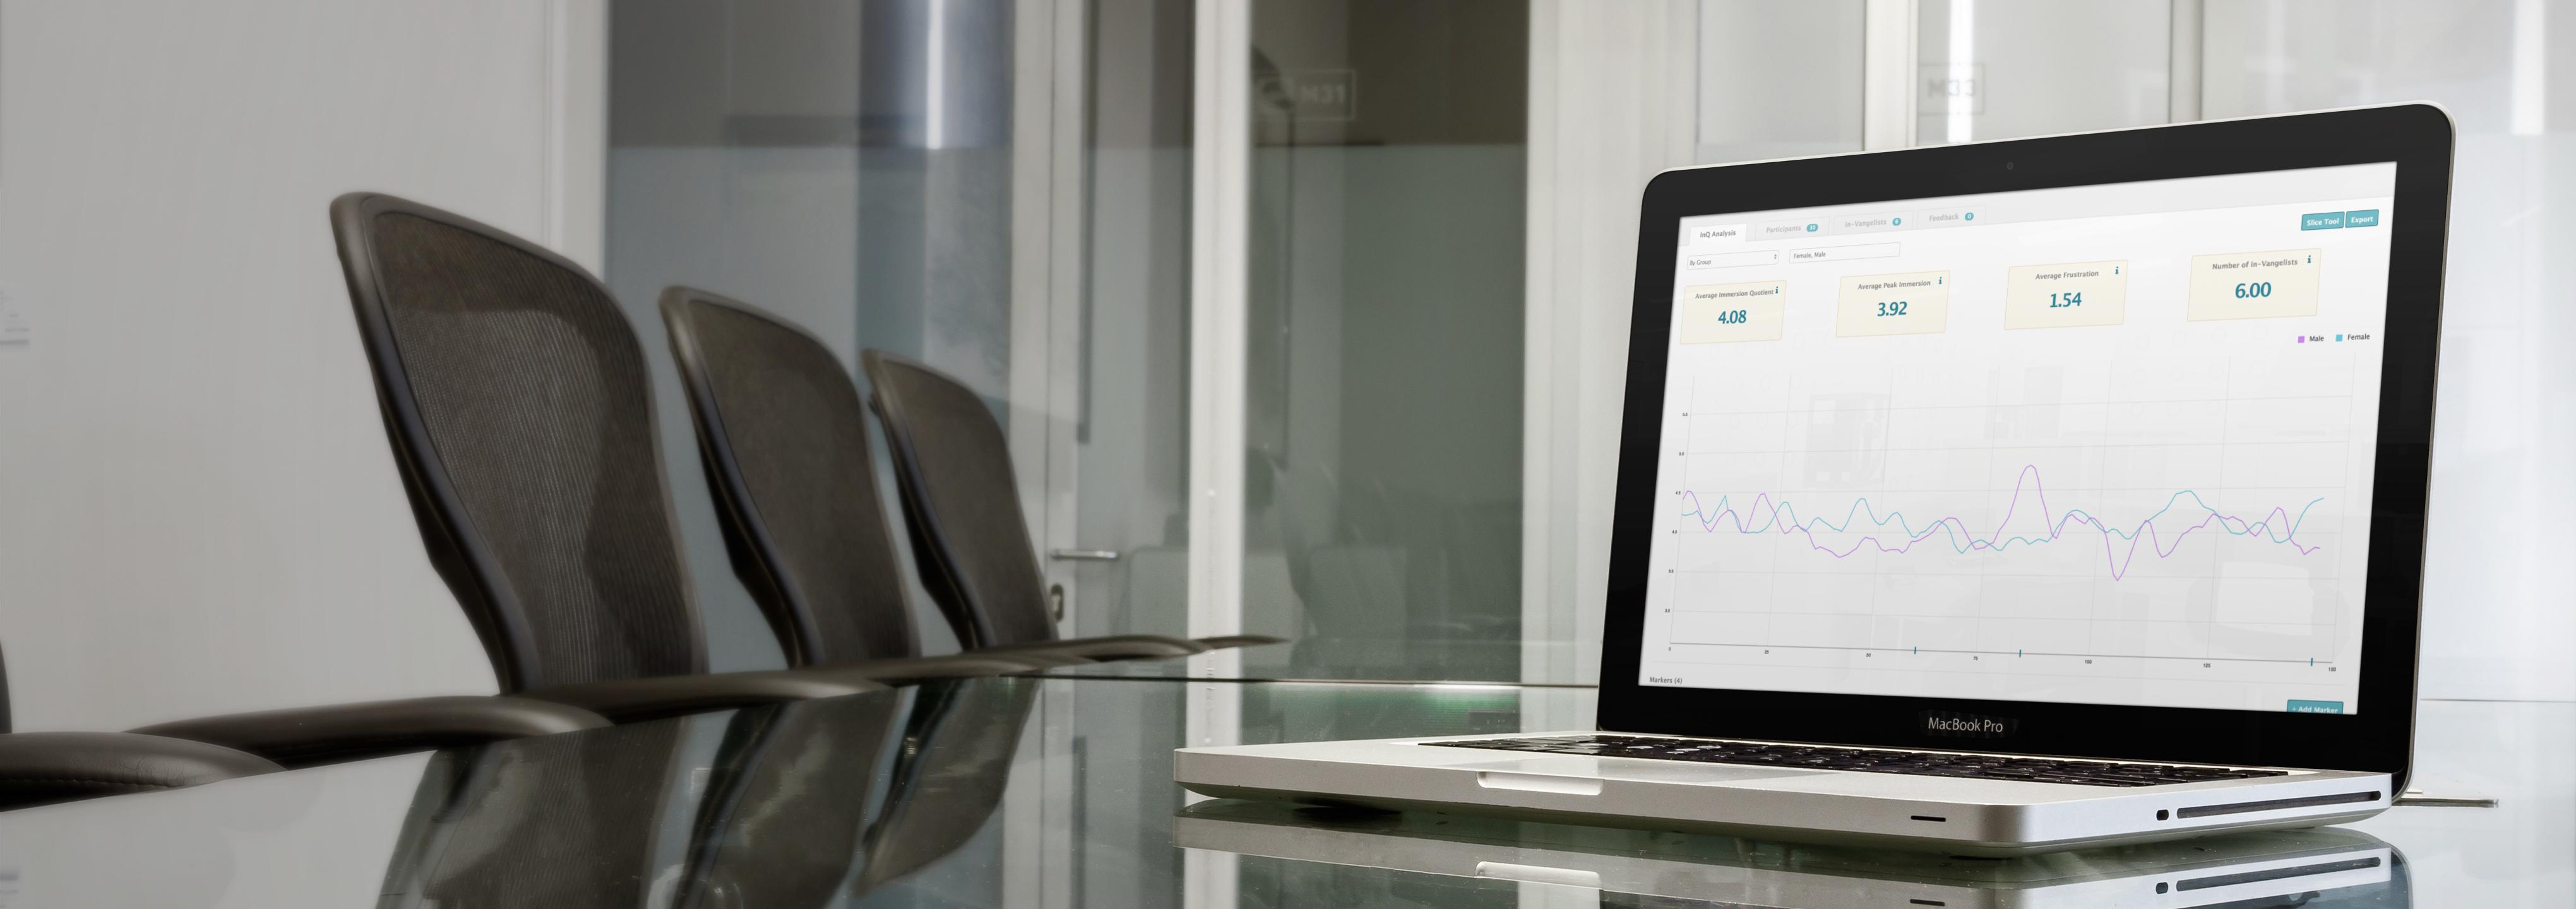 macbook-pro-over-glass-desk-in-business-room-wide